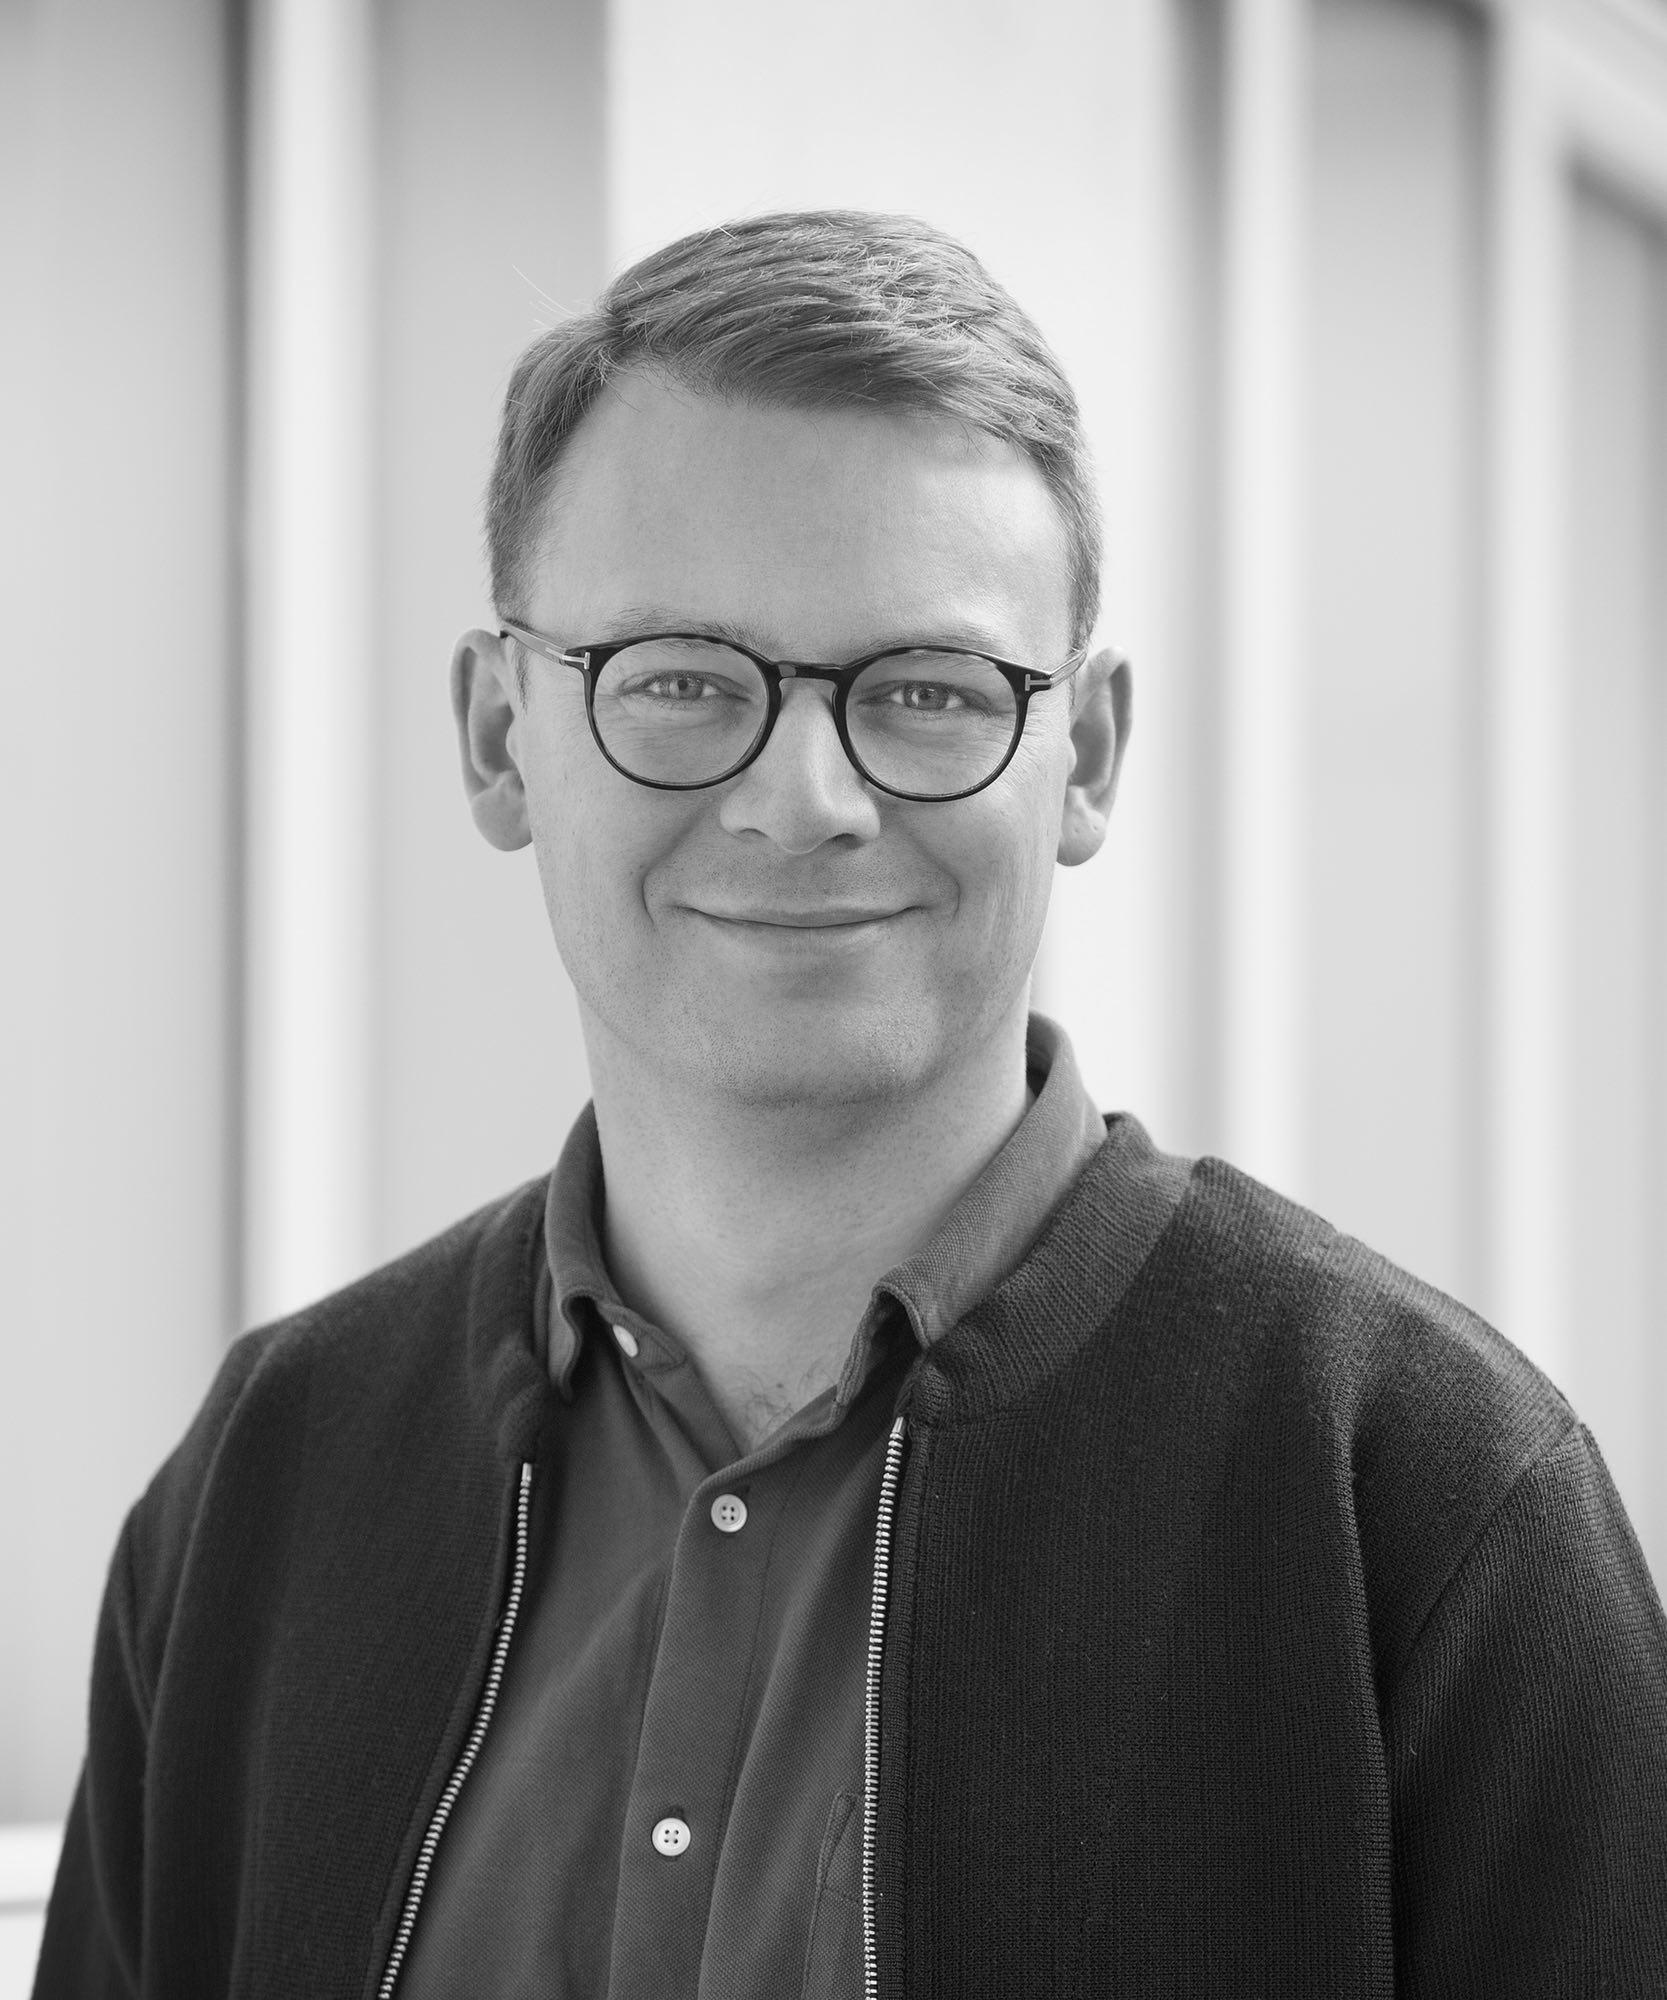 Mit navn er Alexander Skovgaard Kvarning. Jeg har som privatpraktiserende psykolog min egen praksis i Herning midtby sammen med min kone, Karen.